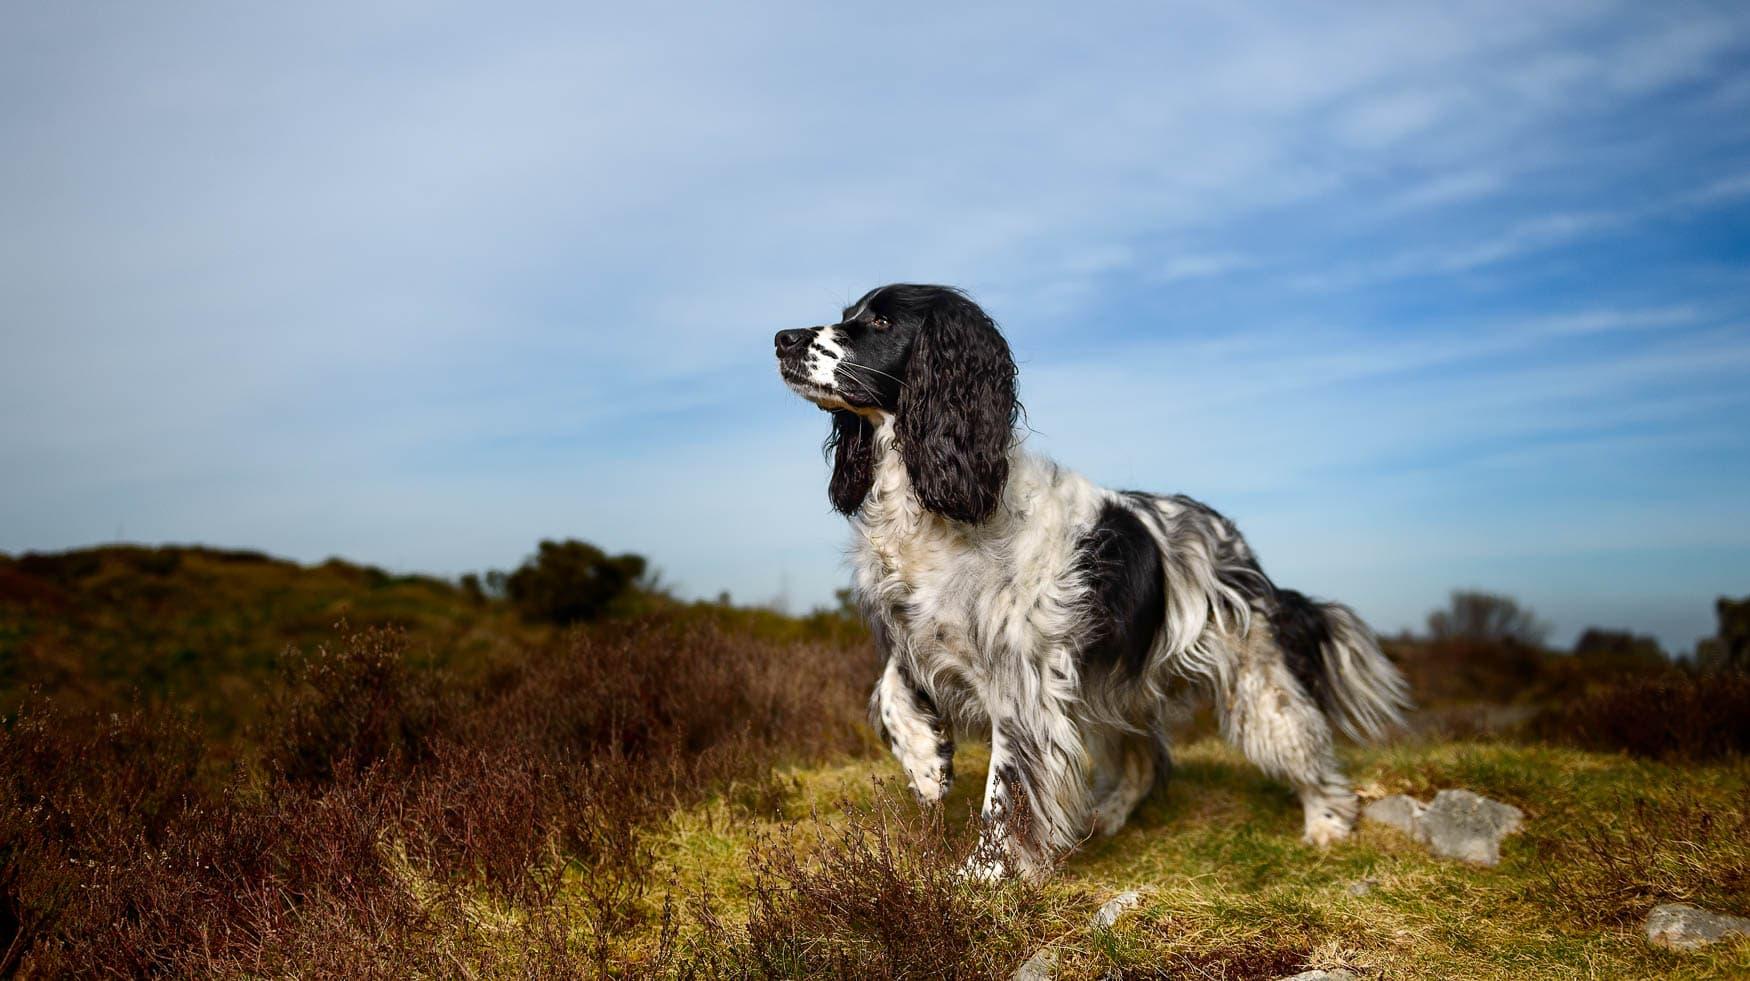 Shropshire Dog Photographer - Working Black and White English Springer Spaniel ESS